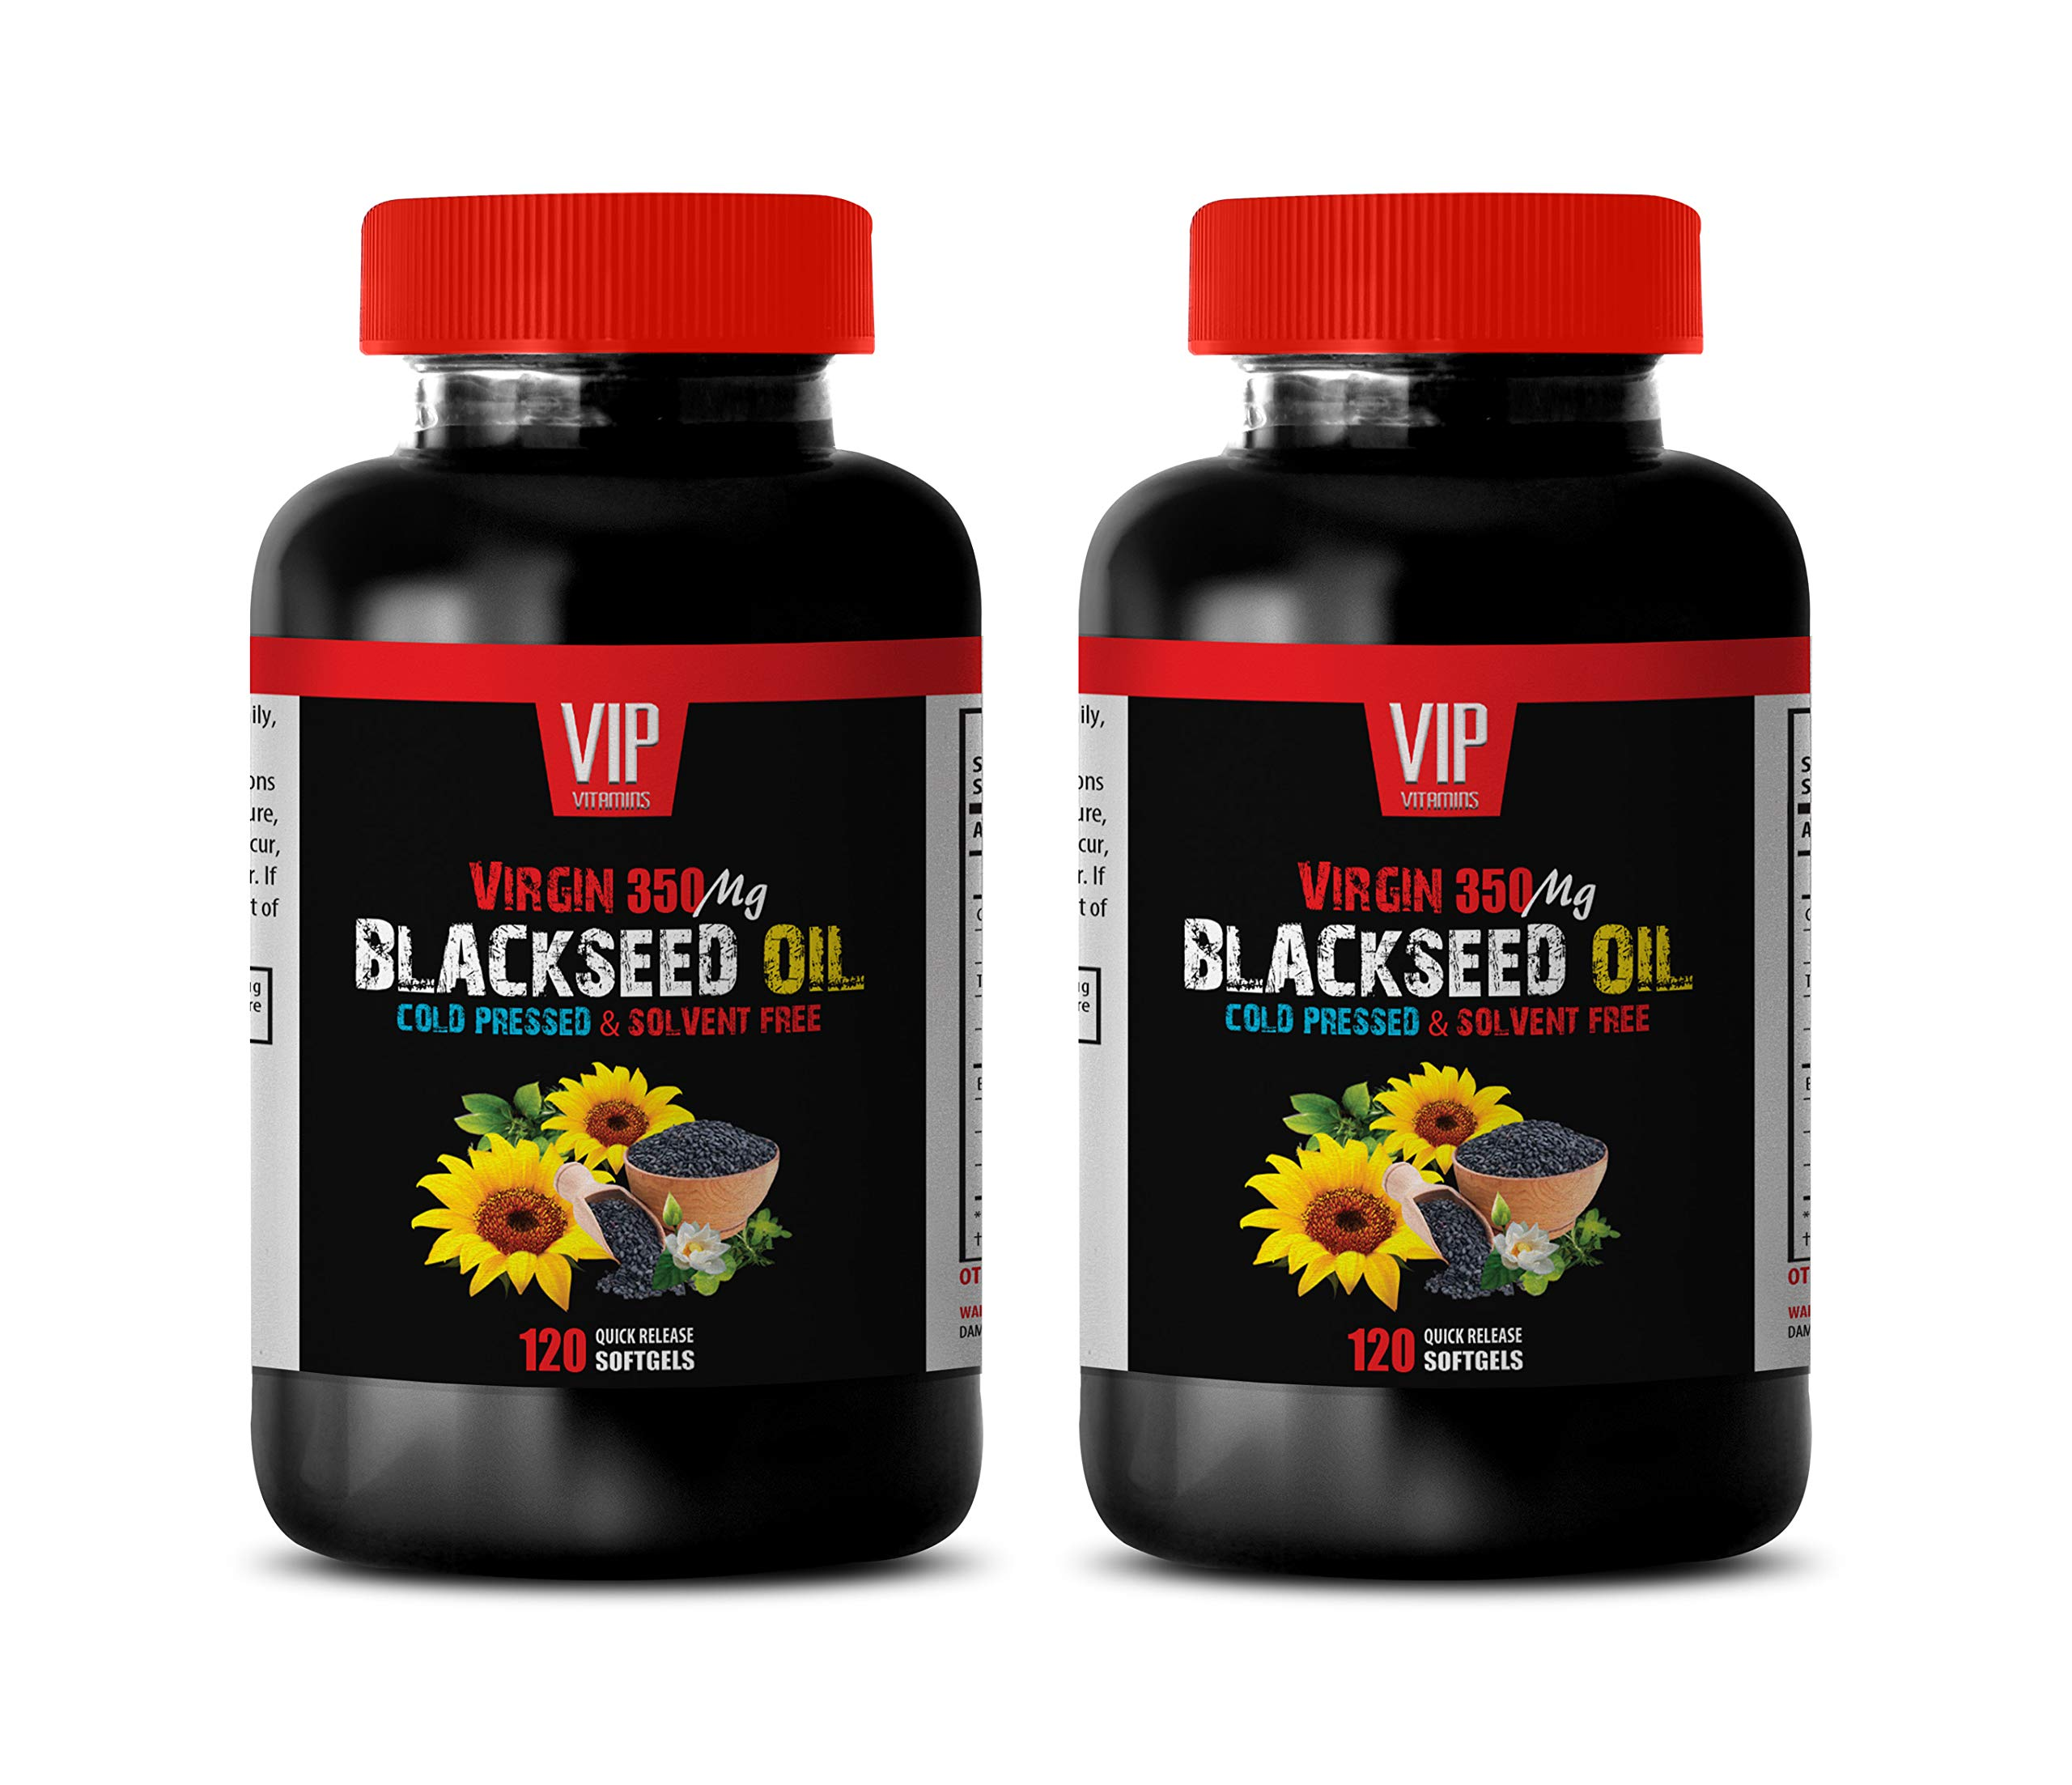 Skin Health Supplements - Black Seed Oil Virgin 350 MG - Black Seed Oil softgel Capsules - 2 Bottles 240 Softgels